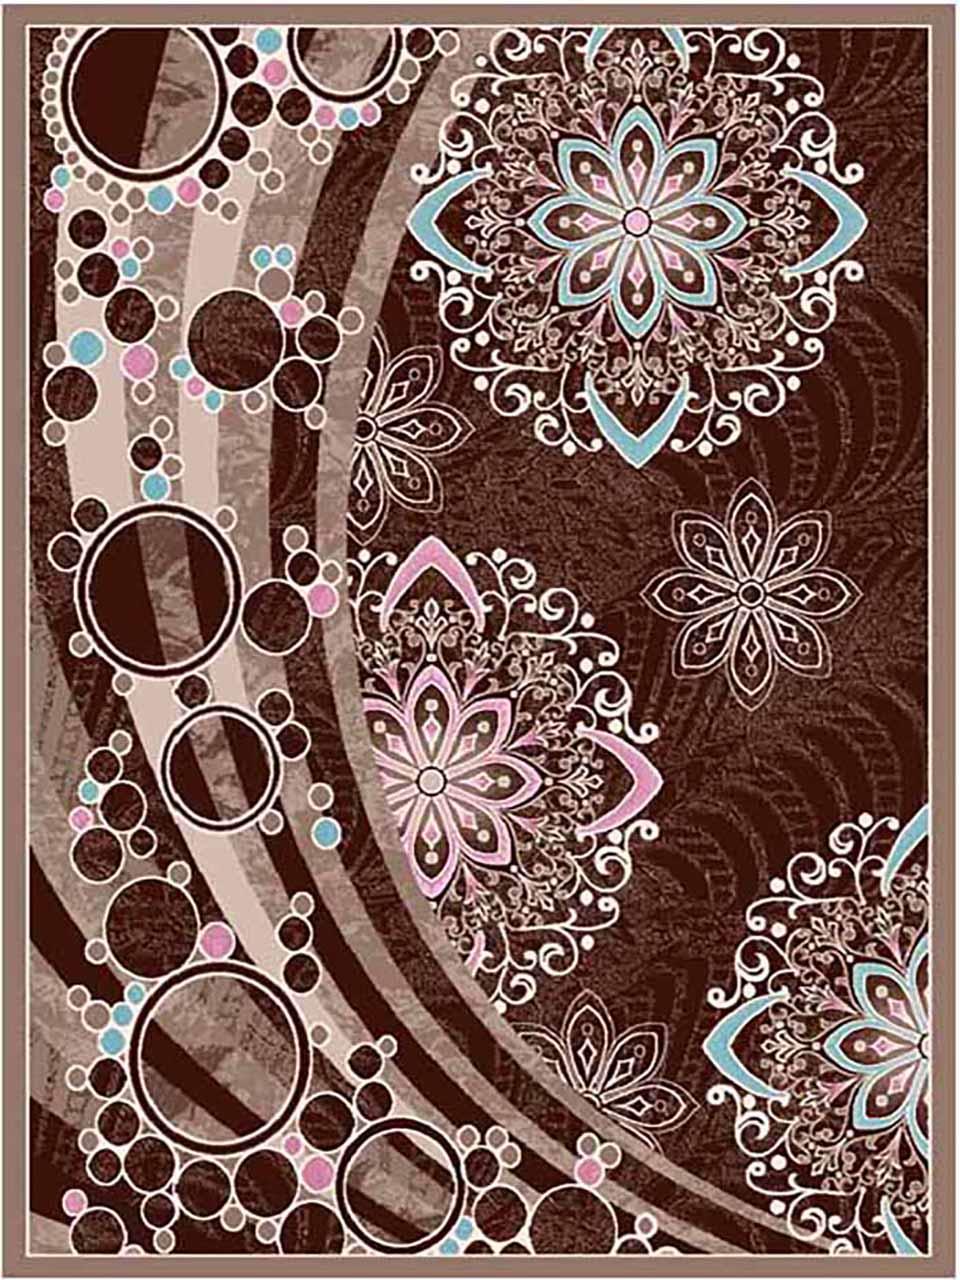 فرش (7002) پلی پرو پیلن - 8 رنگ - 410 شانه - کرم قهوه ای - تراکم 1000